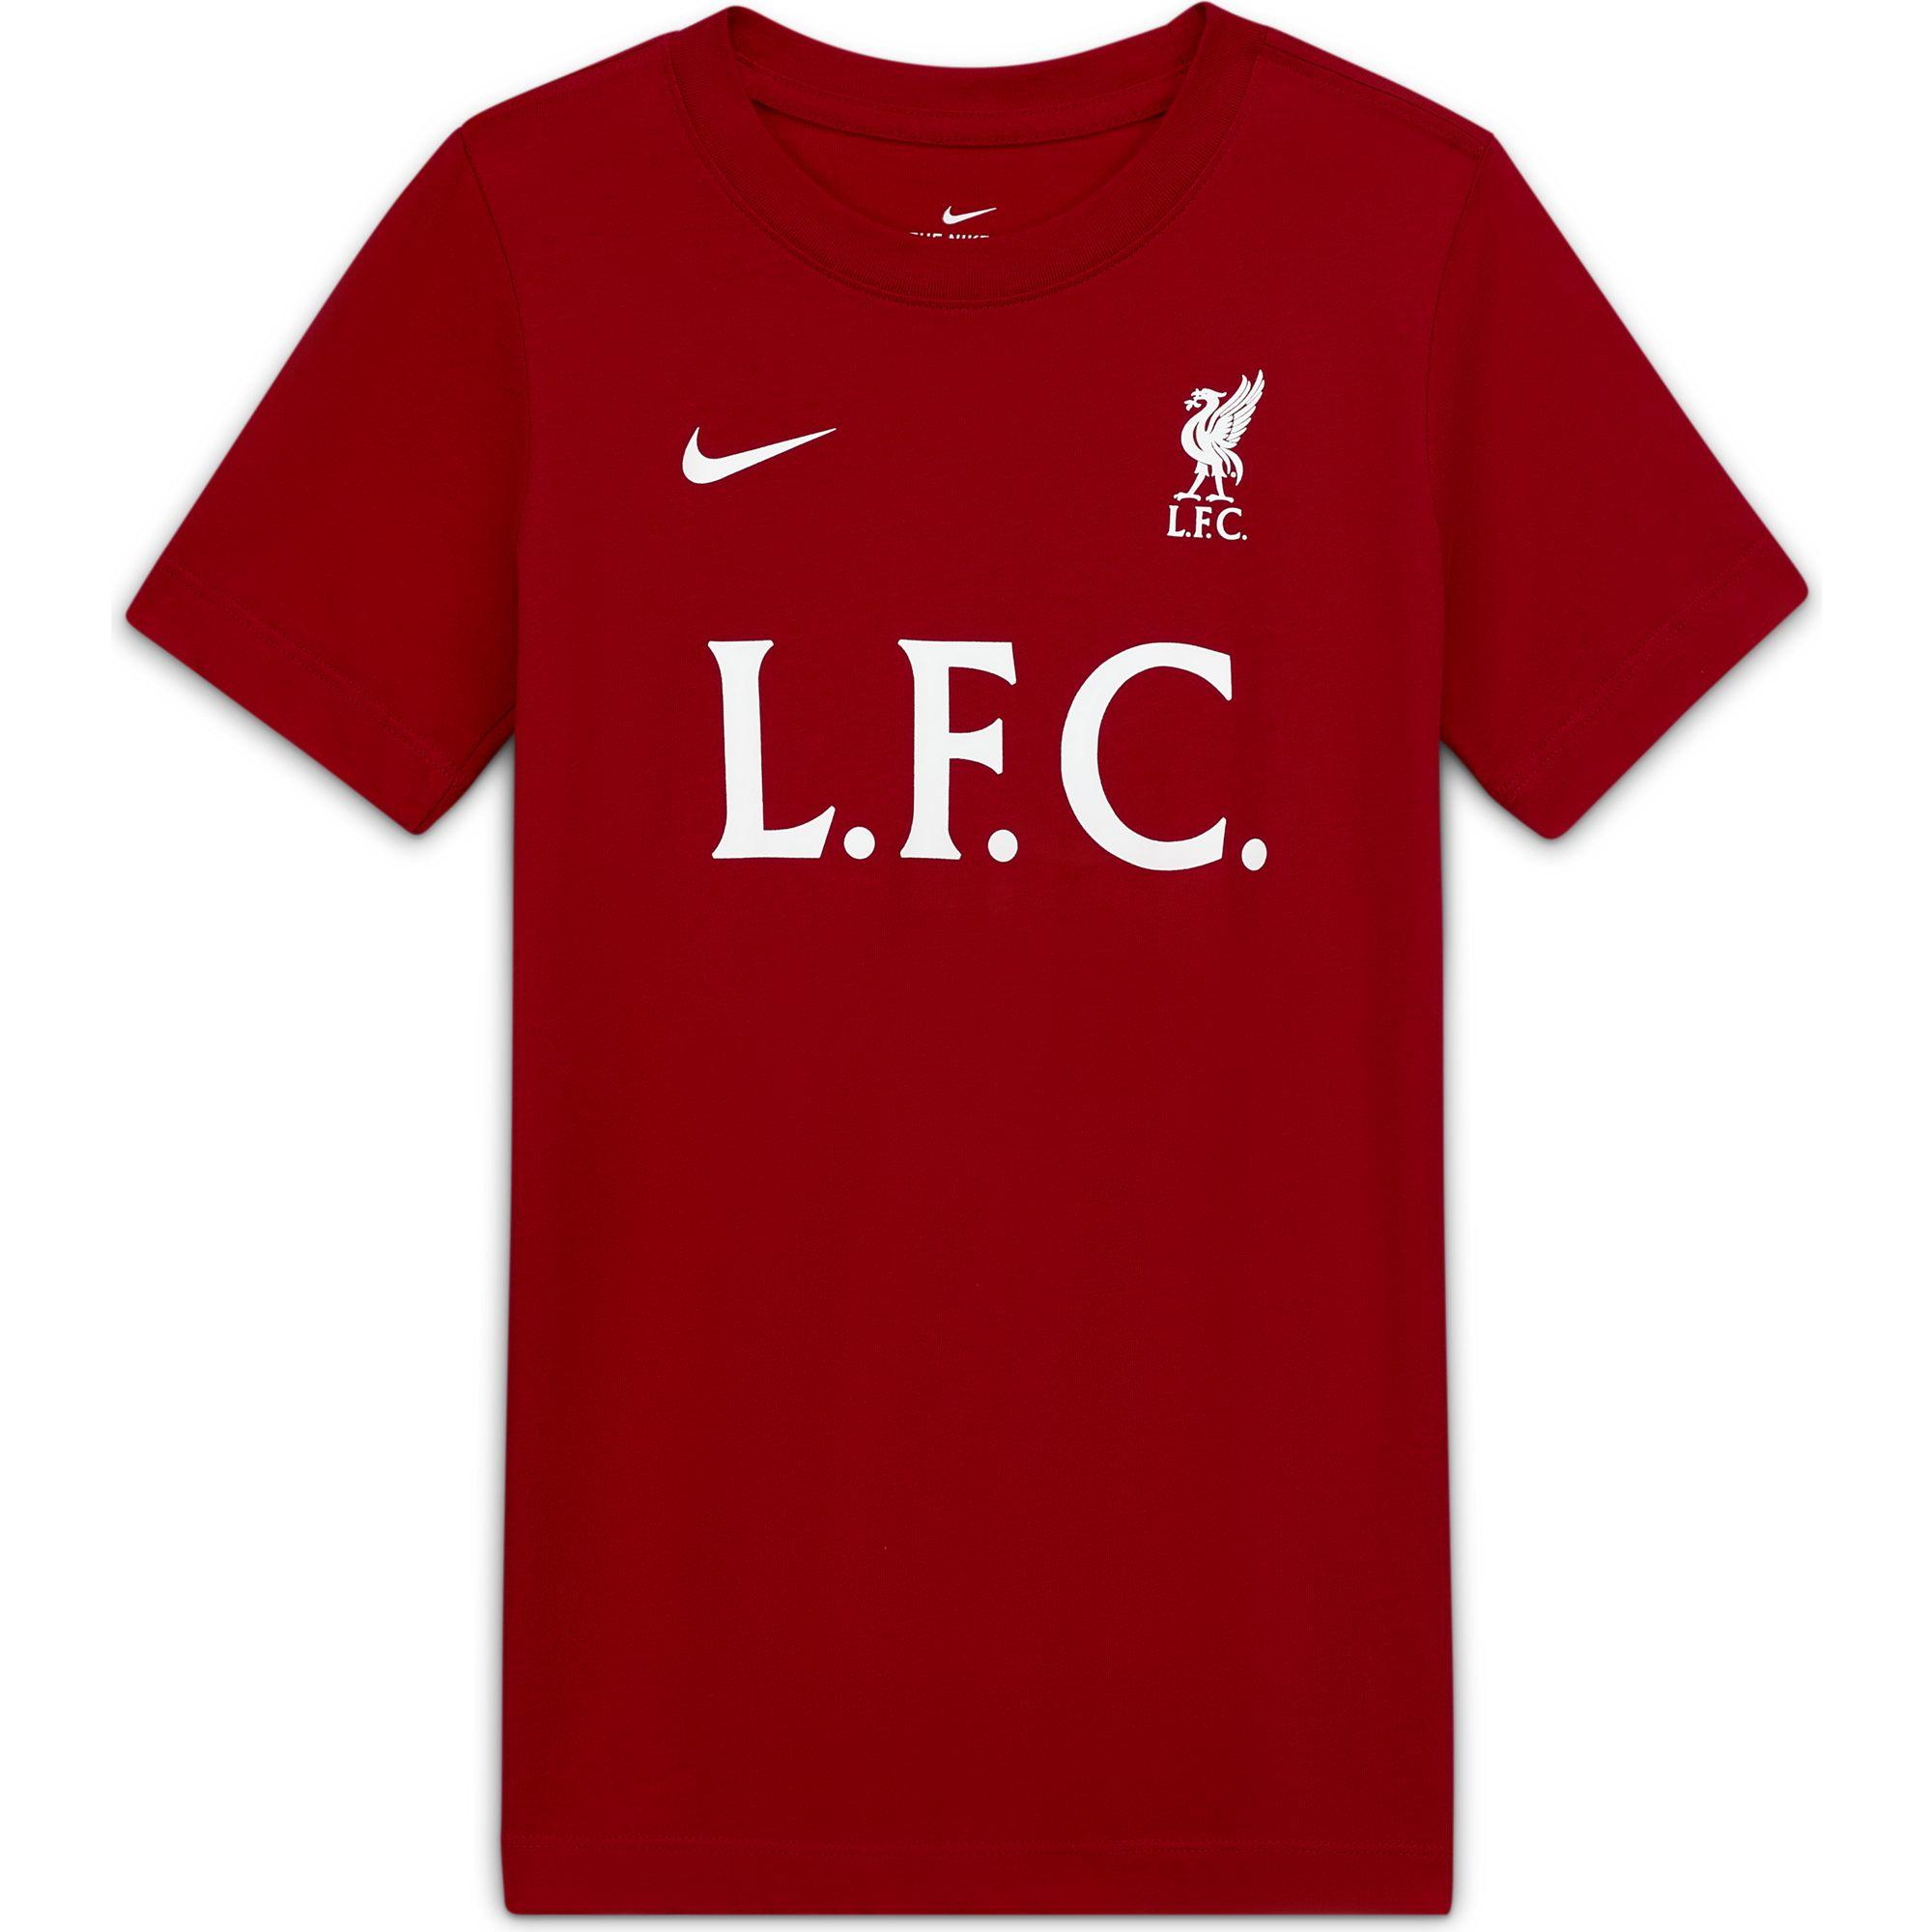 Nike T-shirt  Liverpool Junior  20/21